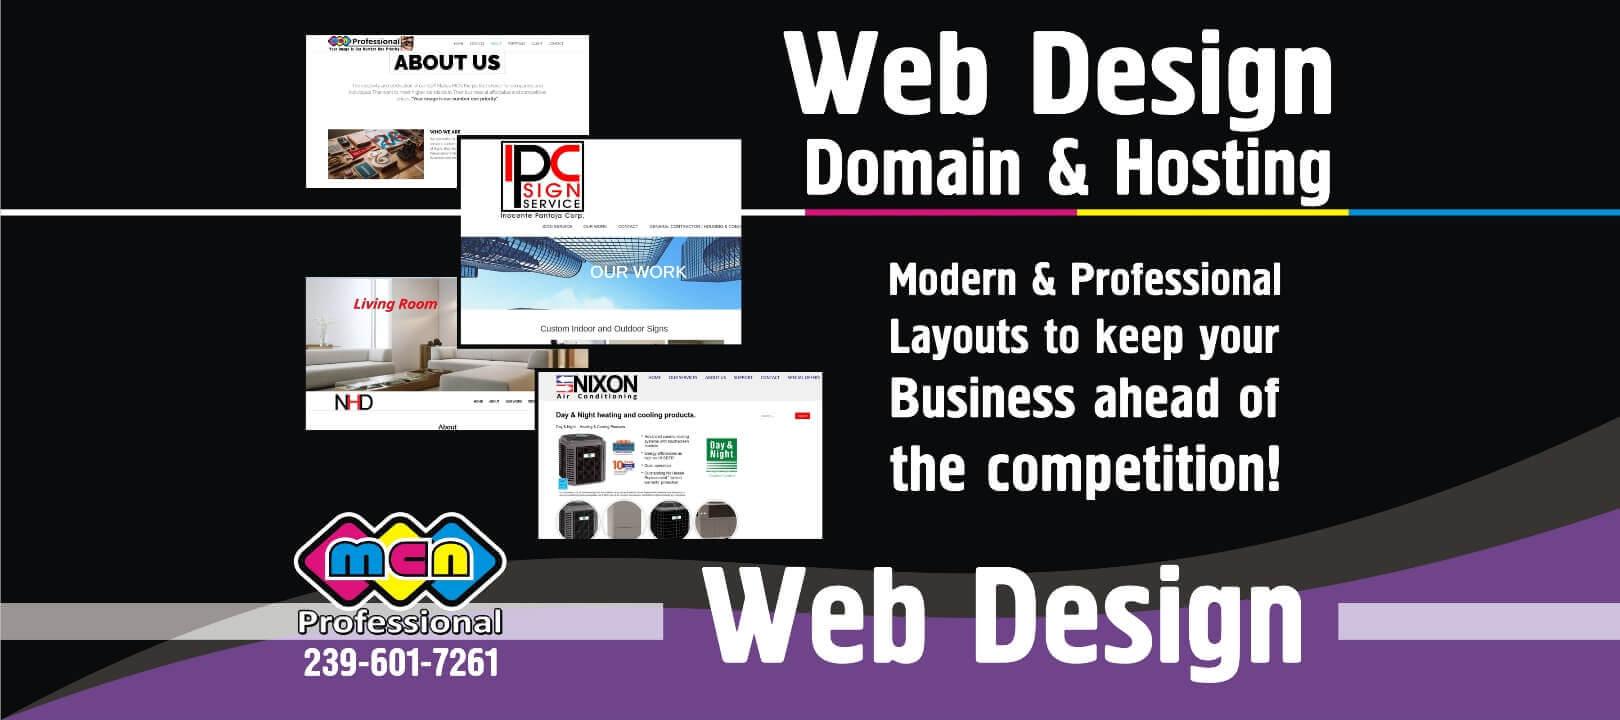 D Web Design domain Hosting